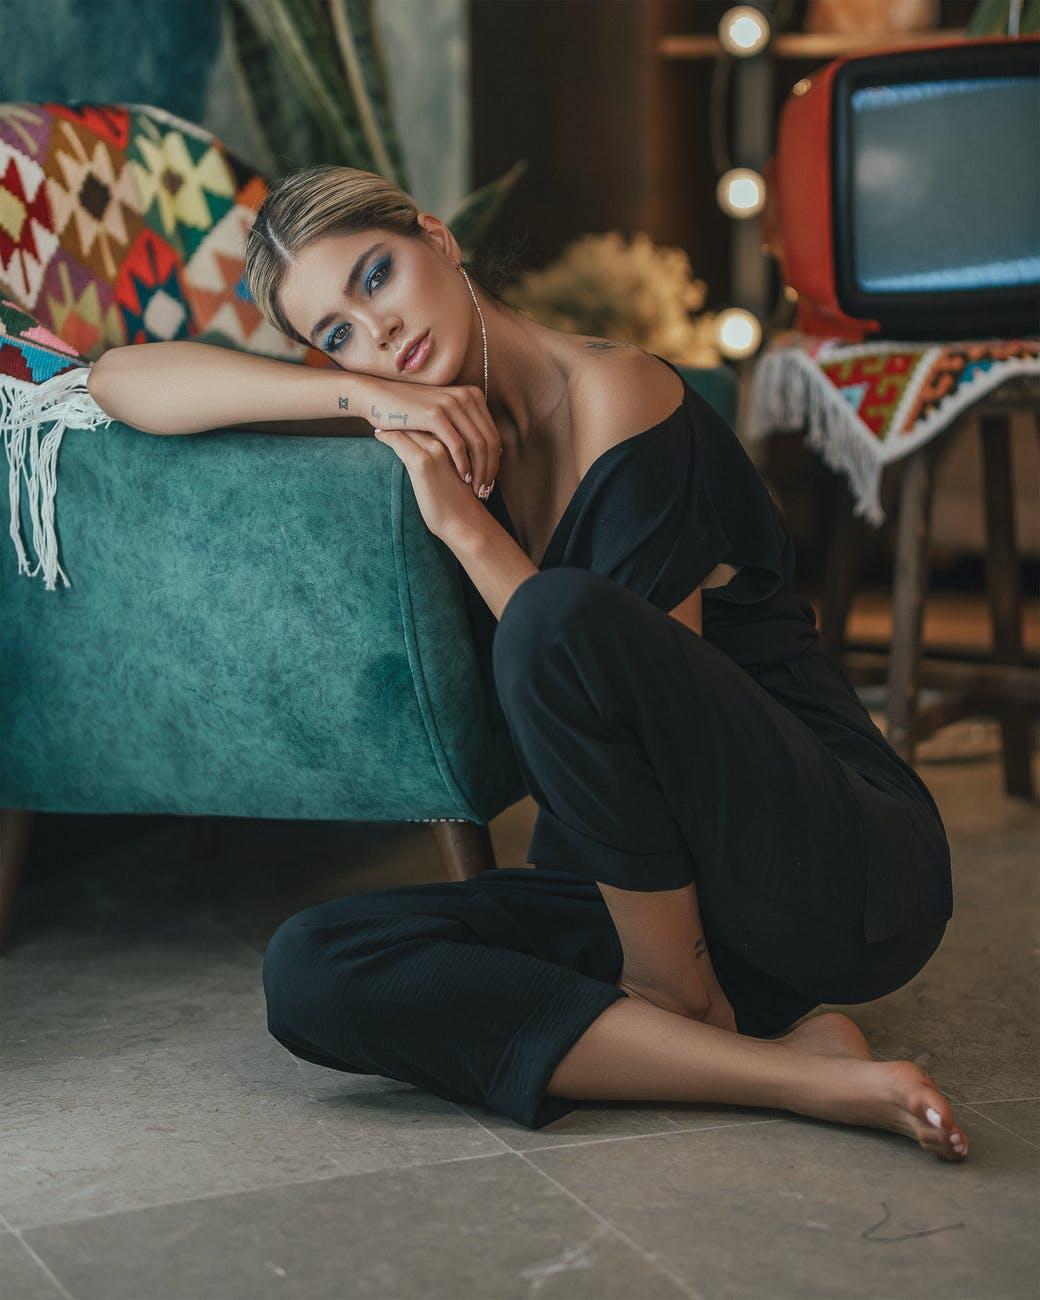 attractive woman sitting on floor in room